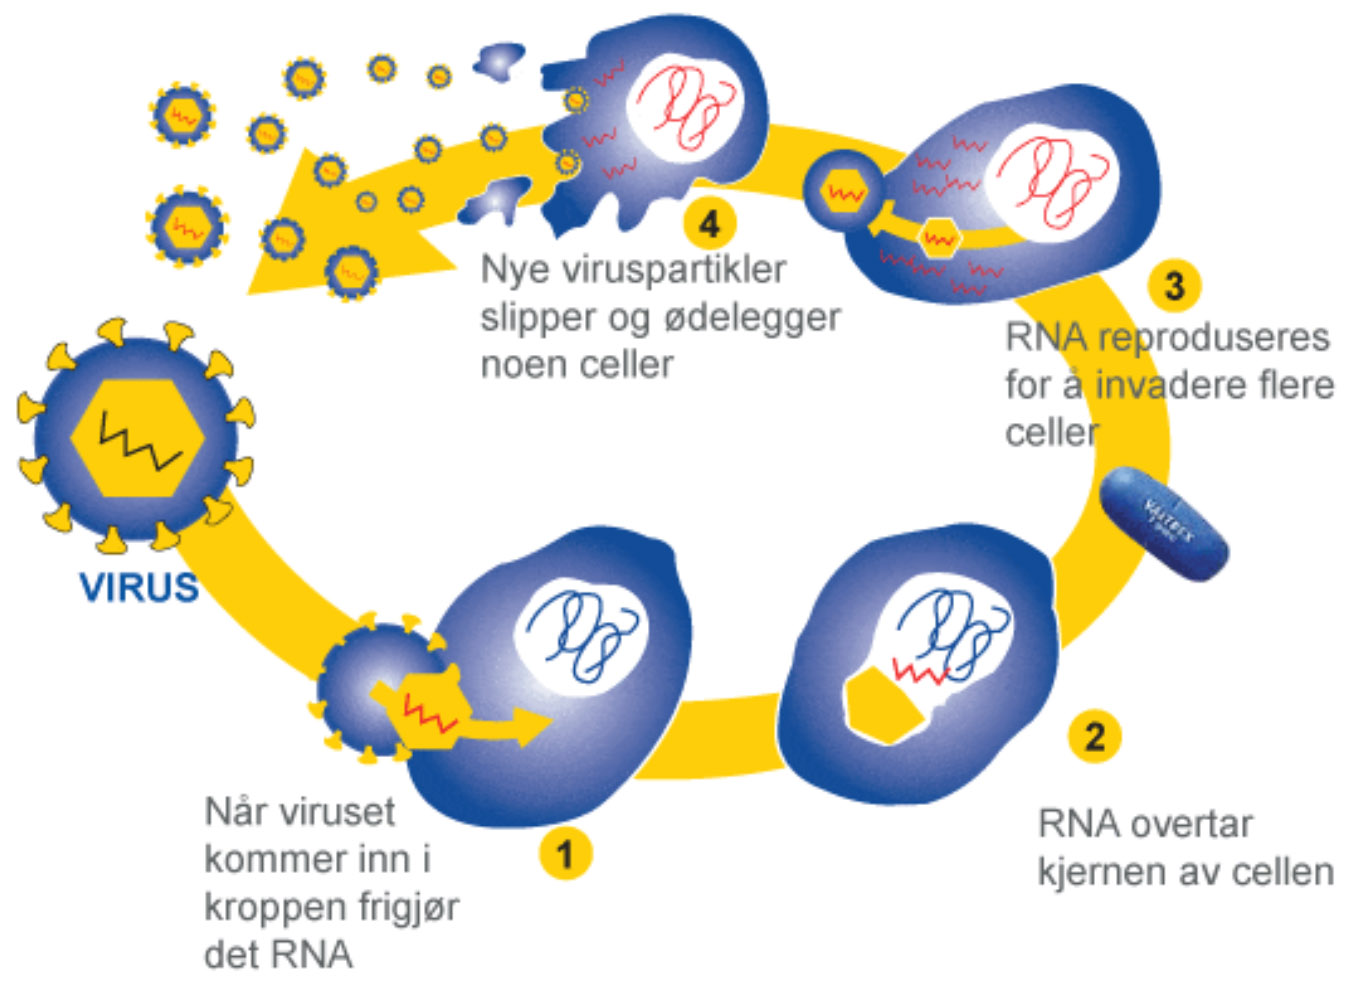 Hvordan infiserer SARS-CoV-2 kroppen? 1